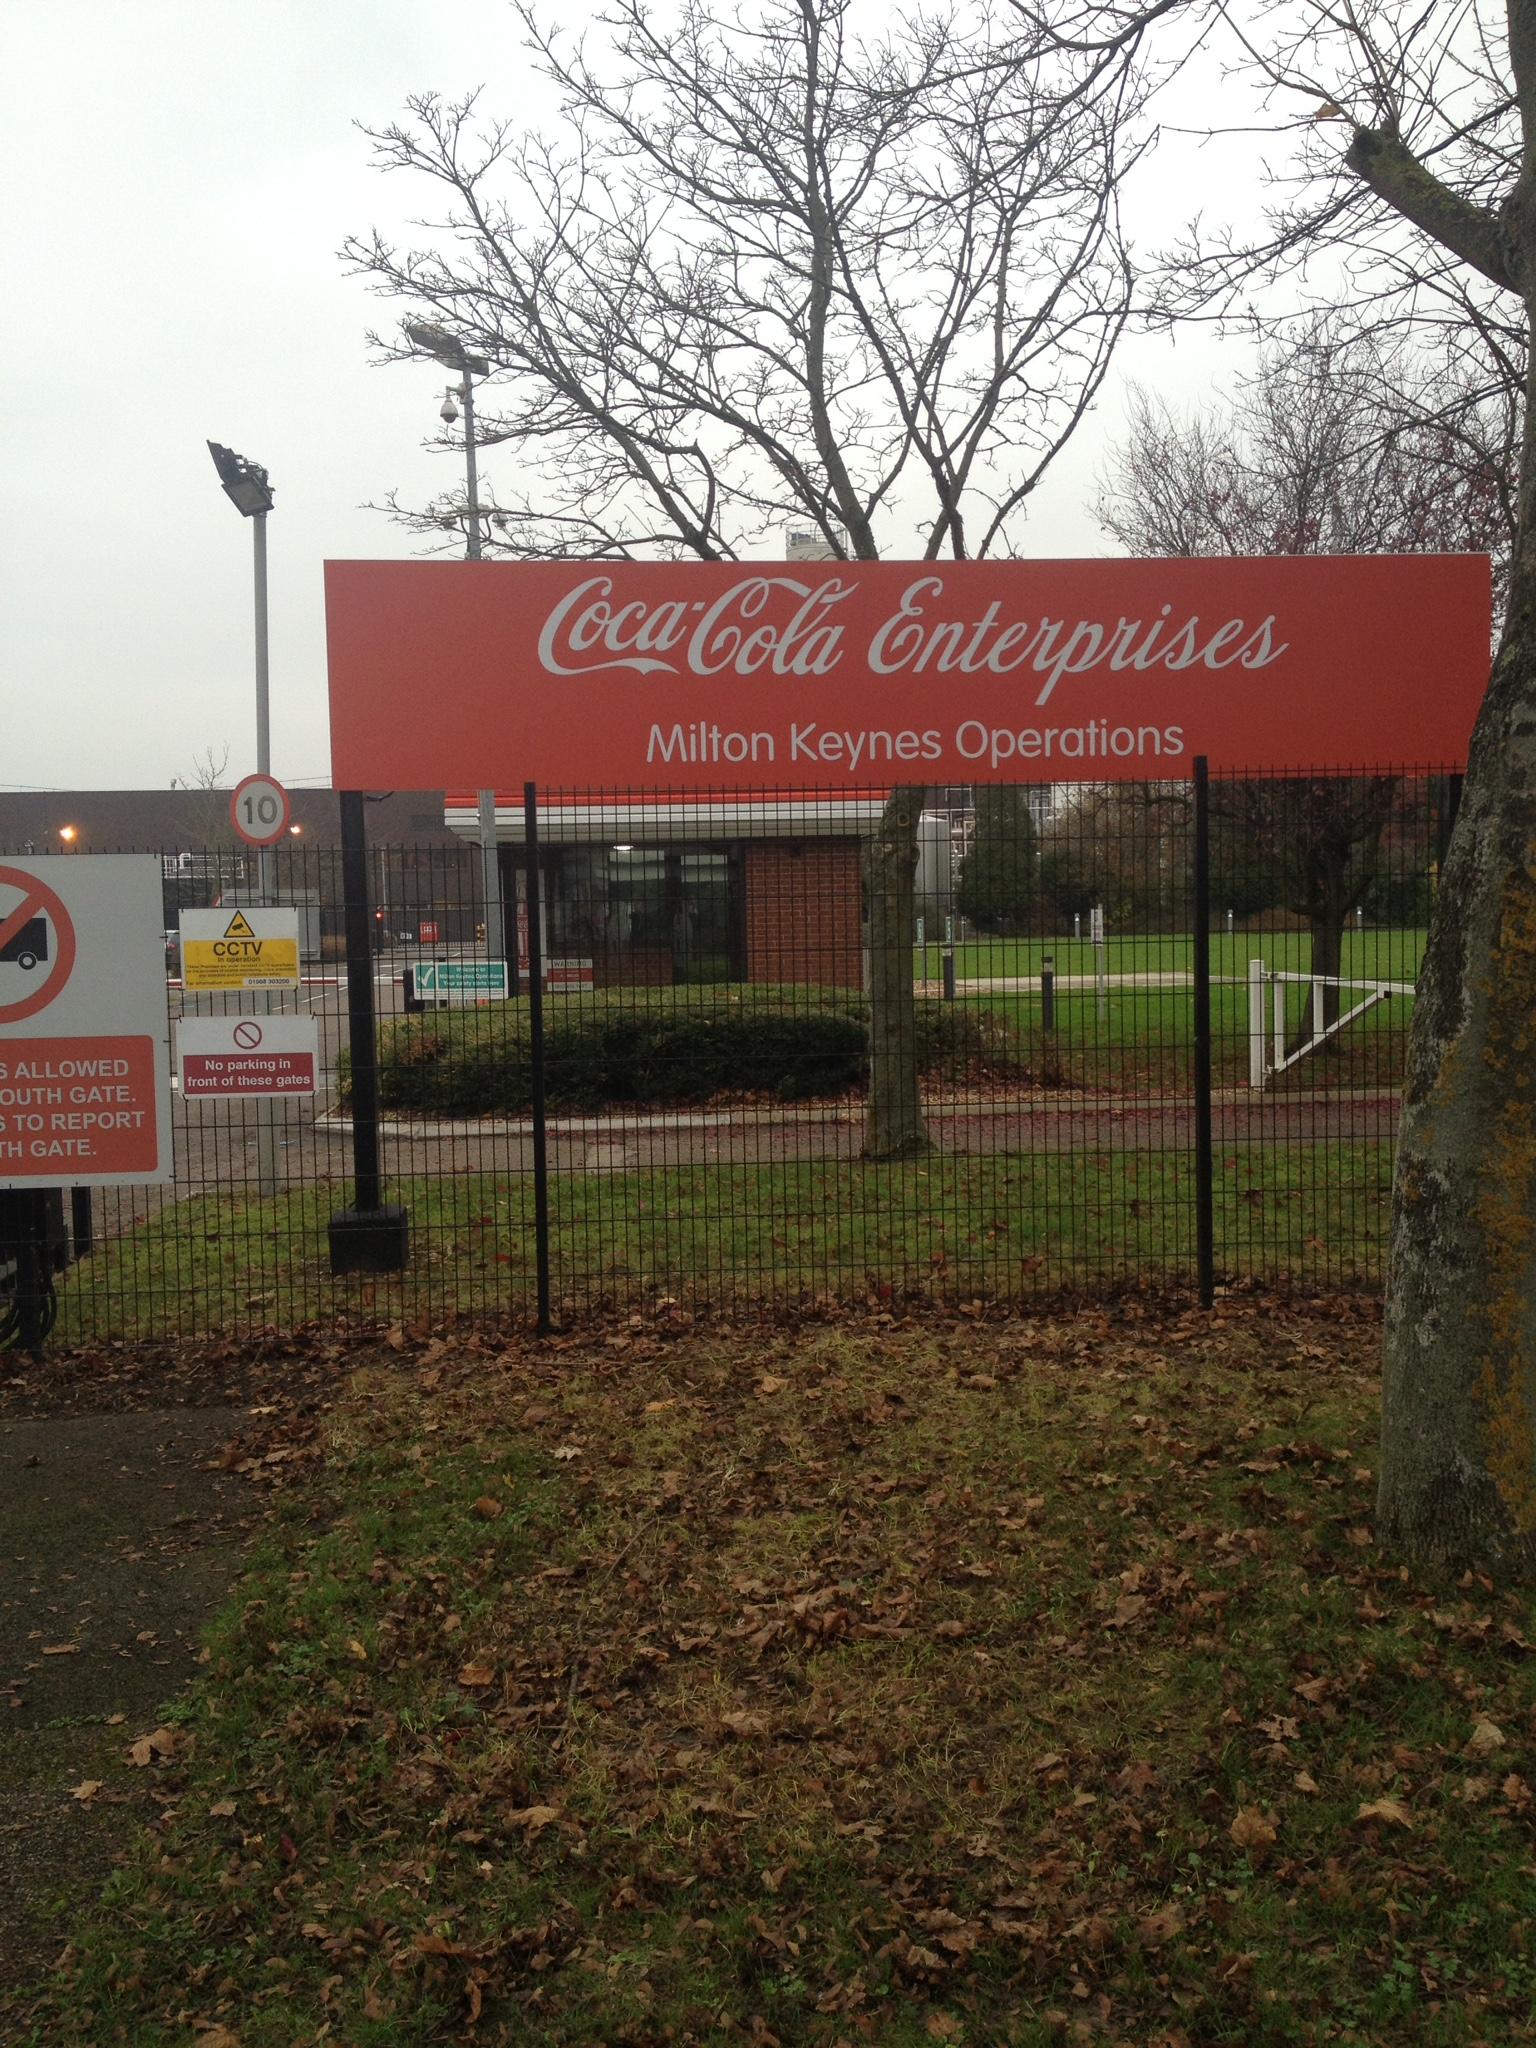 Coca-Cola Enterprises, London, UK